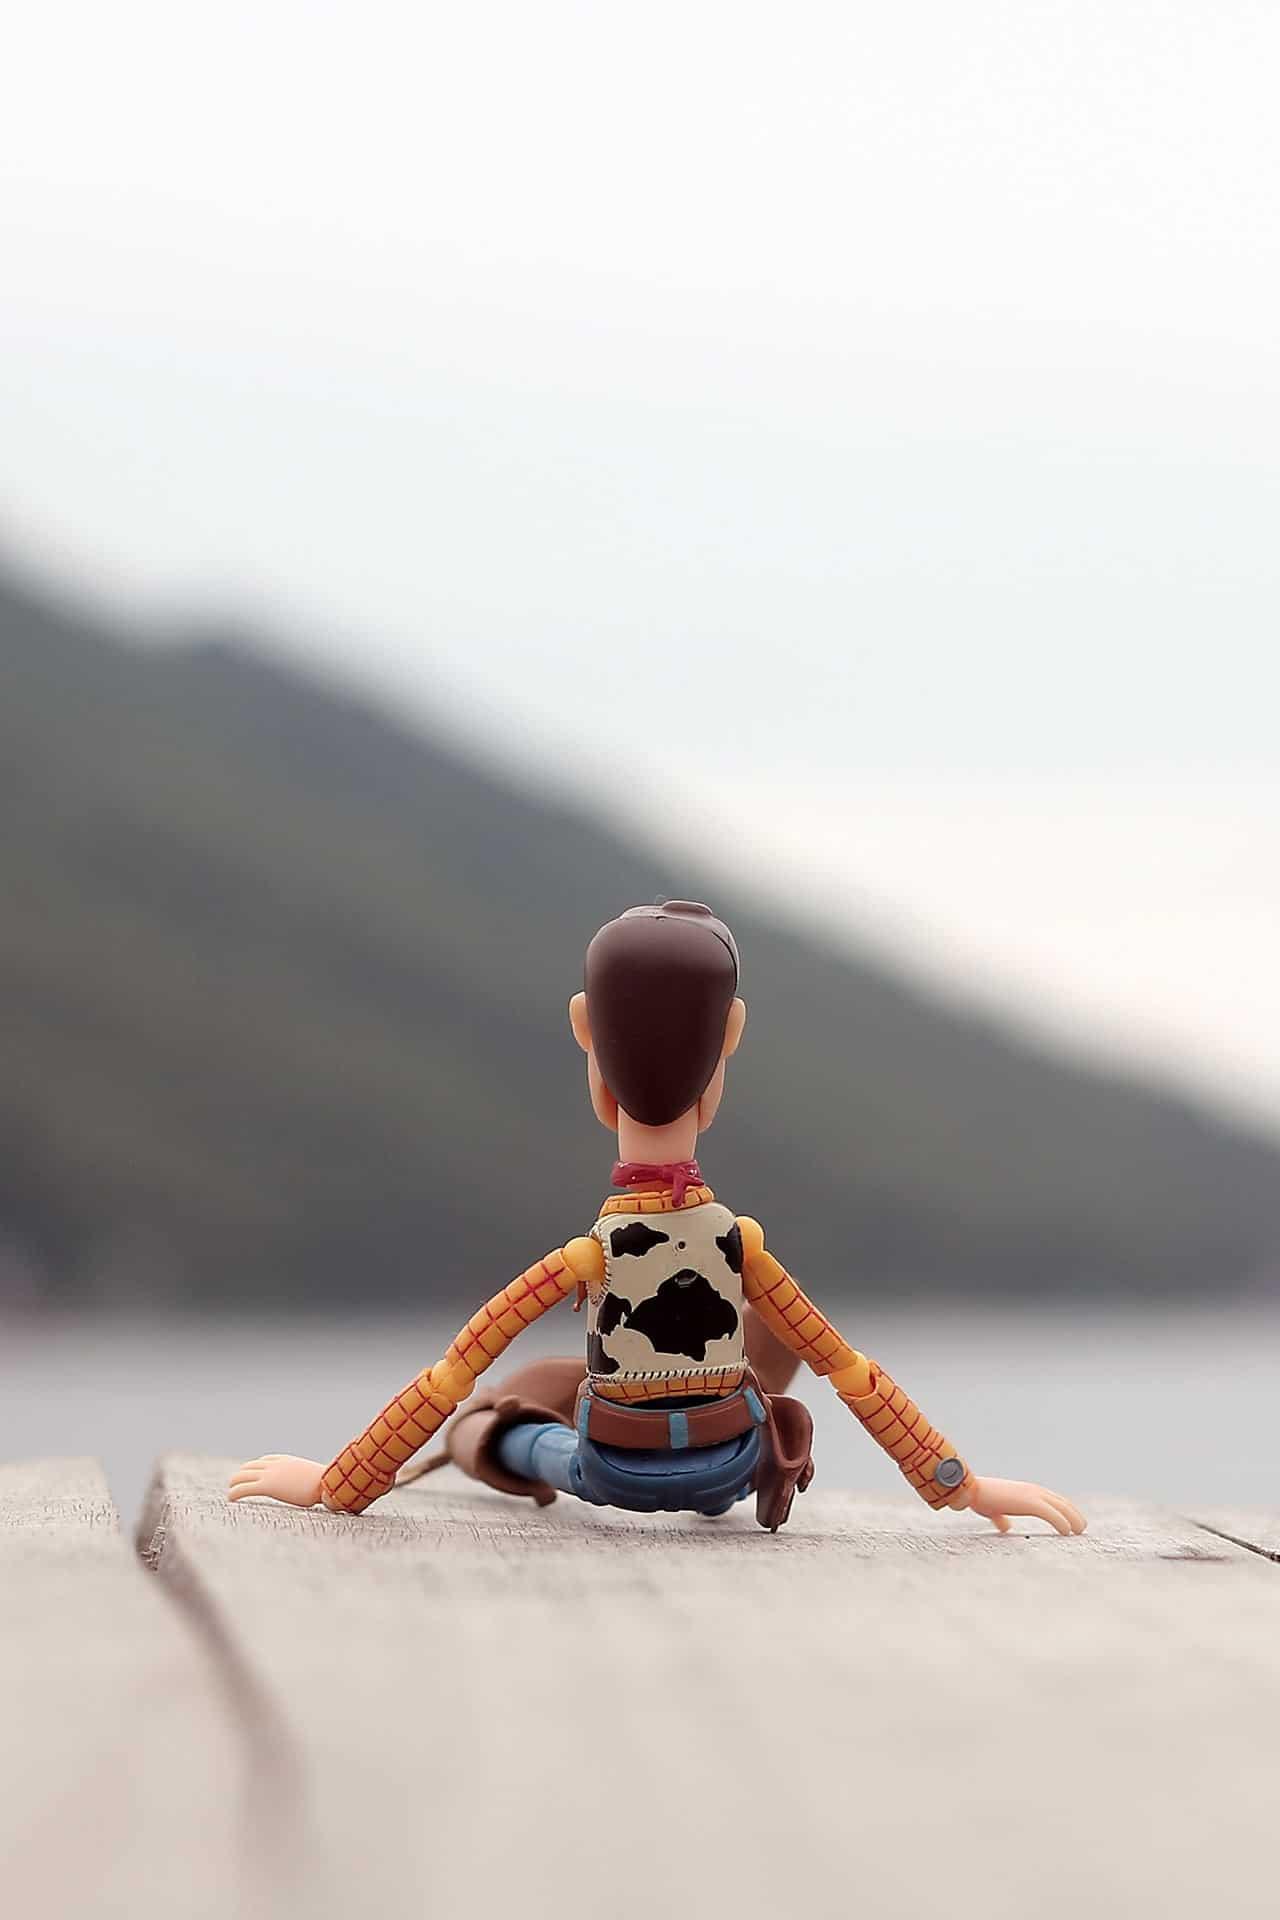 raccontare una bella storia secondo Pixar